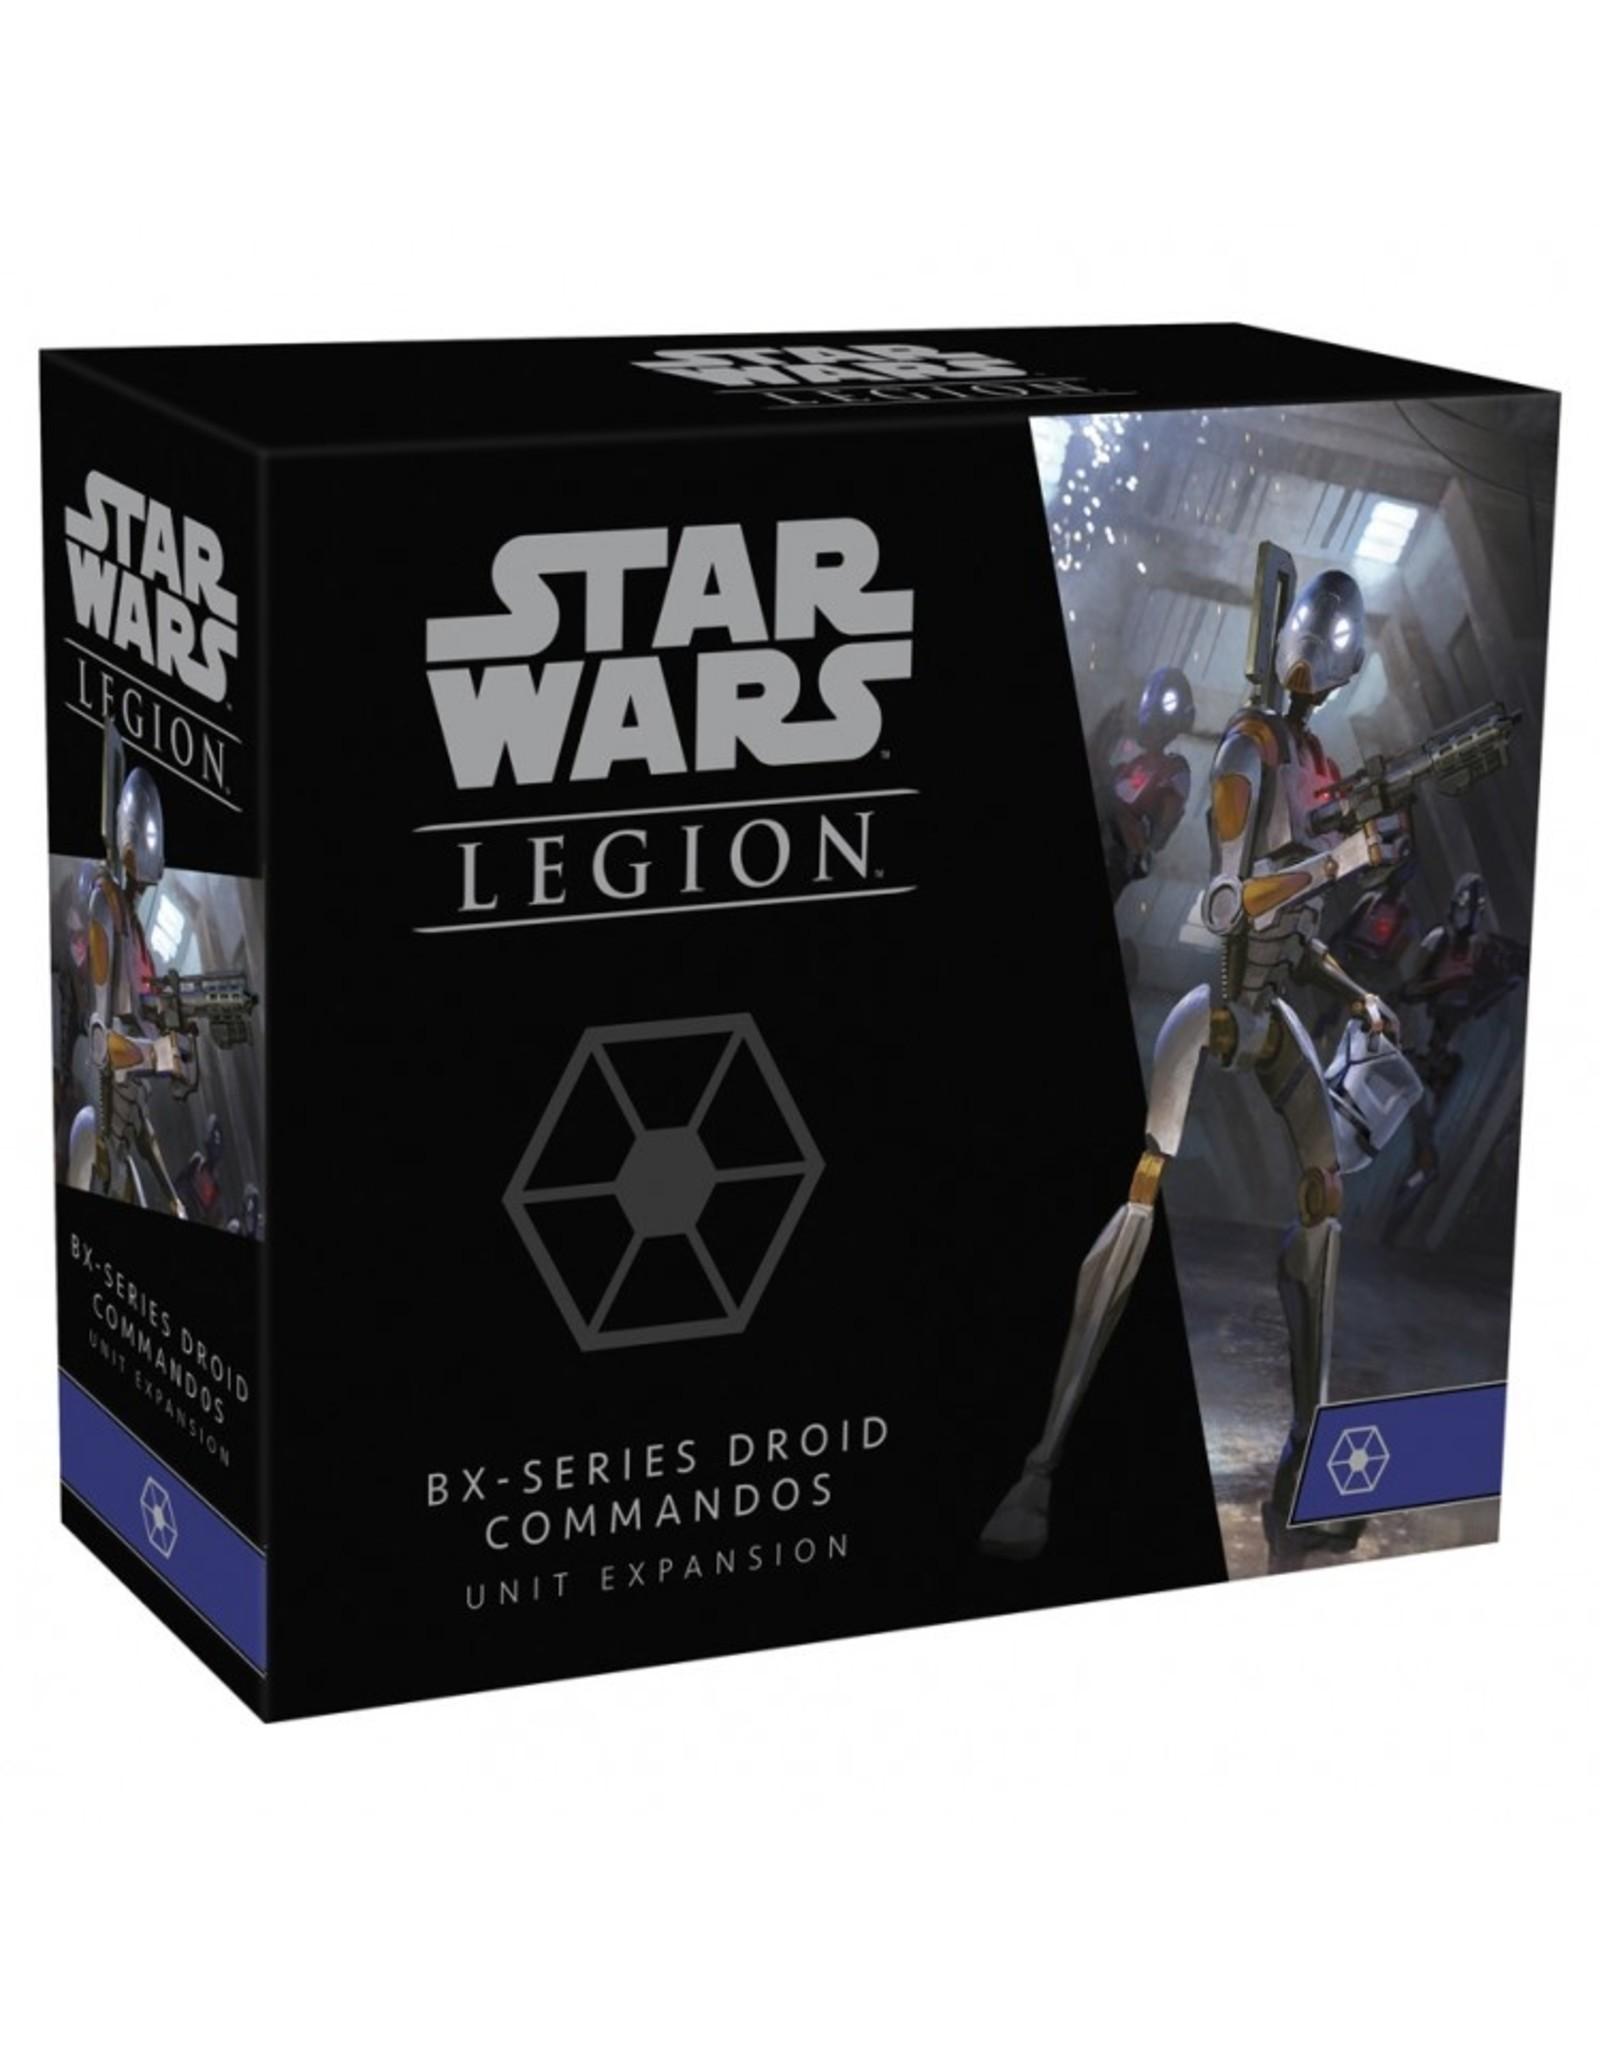 Atomic Mass Games Star Wars Legion: BX-series Droid Commandos